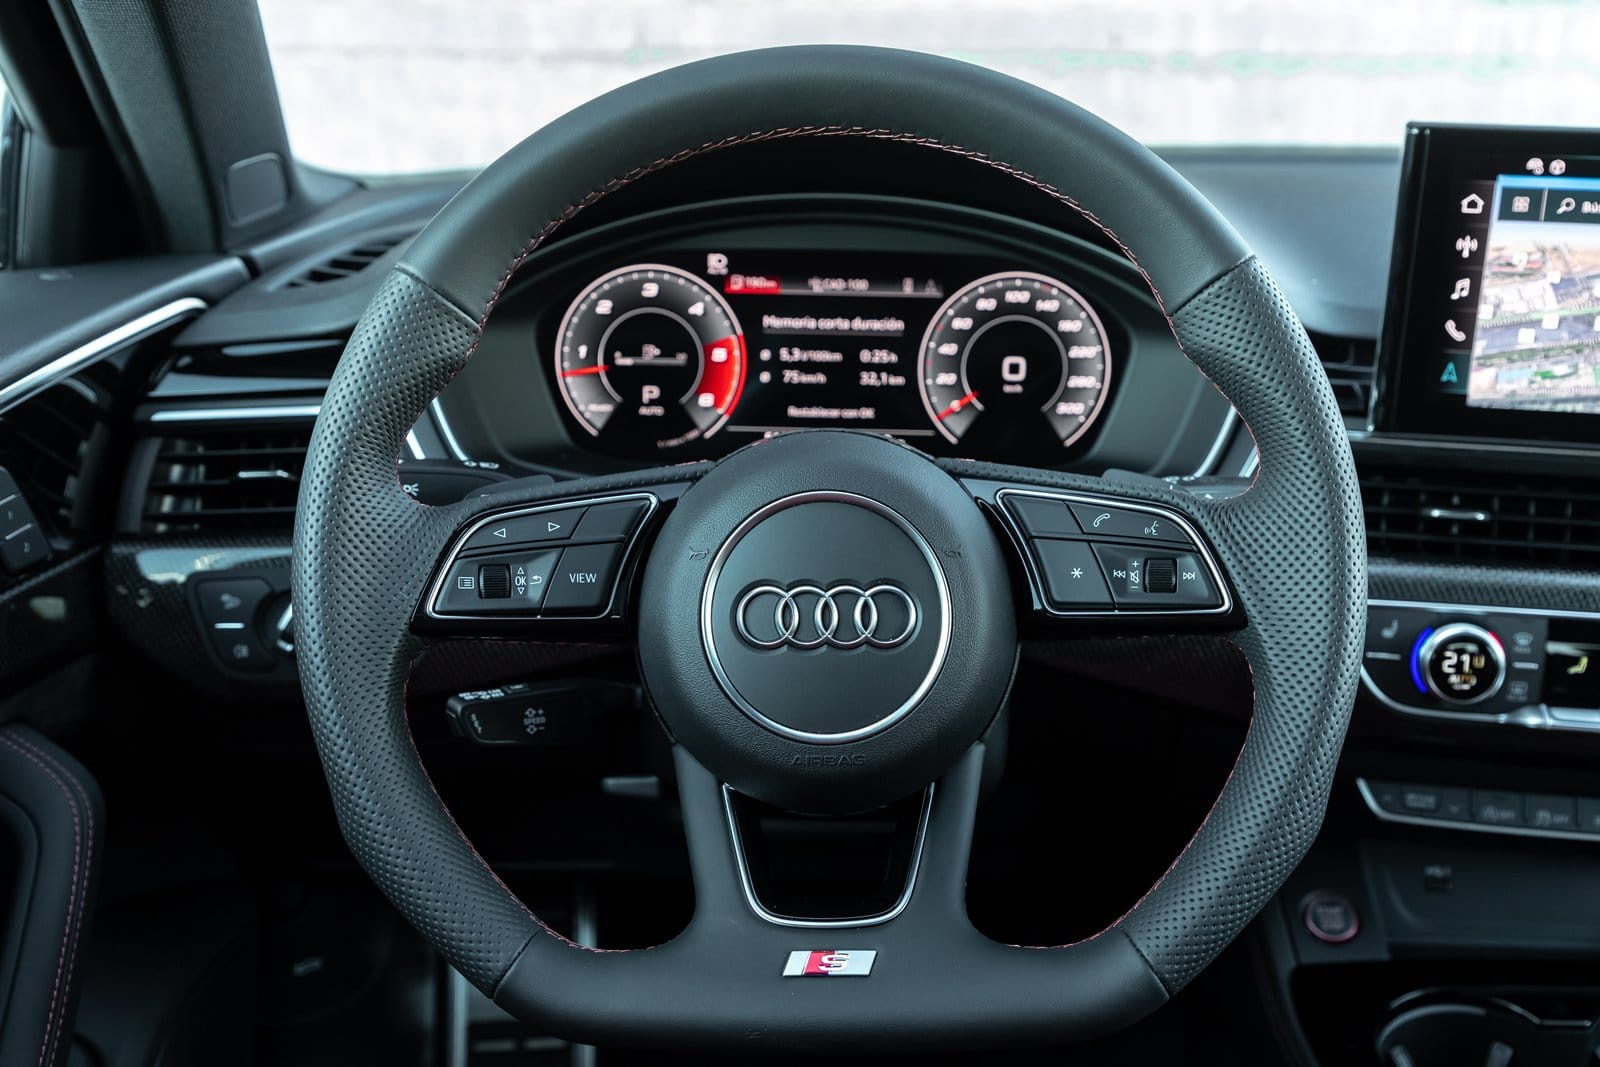 Volante Audi S4 Avant